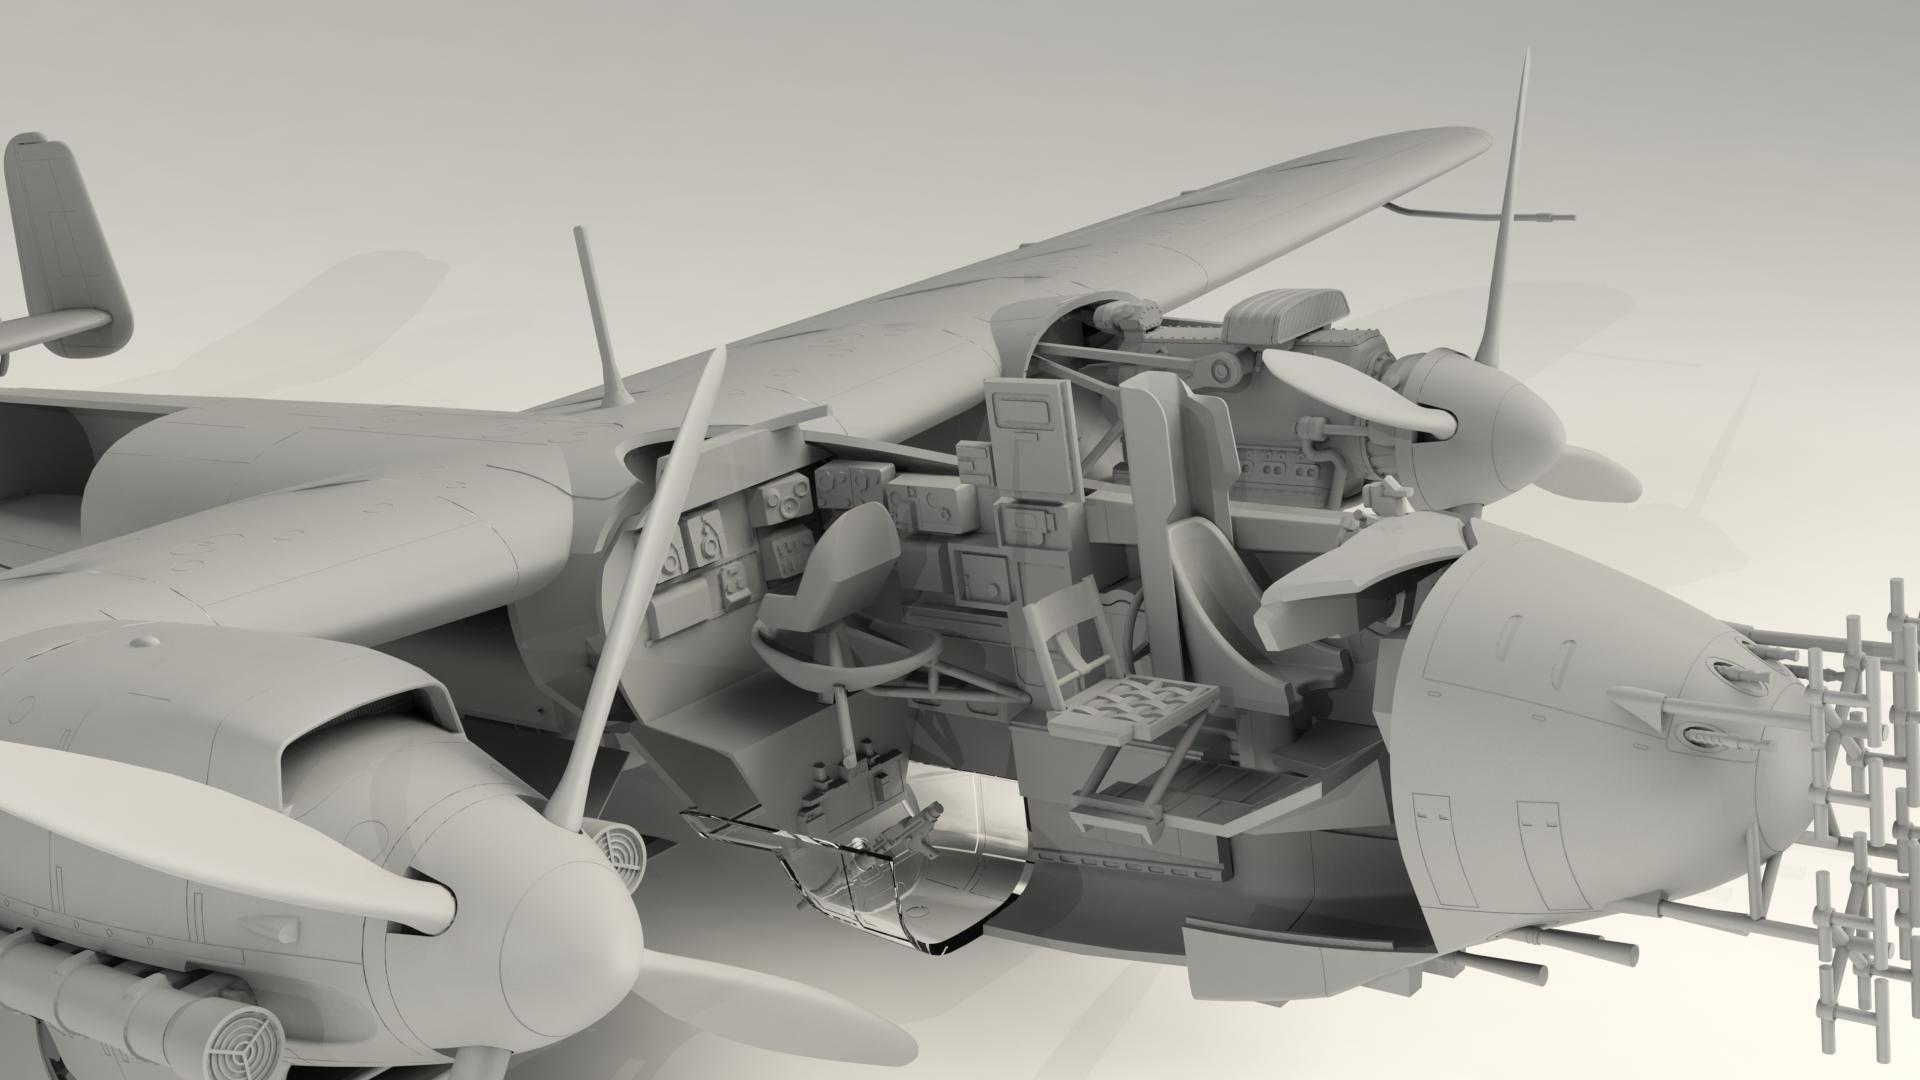 1/48 Do 217N-1, Германский ночной истребитель ІІ МВ #48271 / Do 217N-1, WWII German Night Fighter (100% new molds)